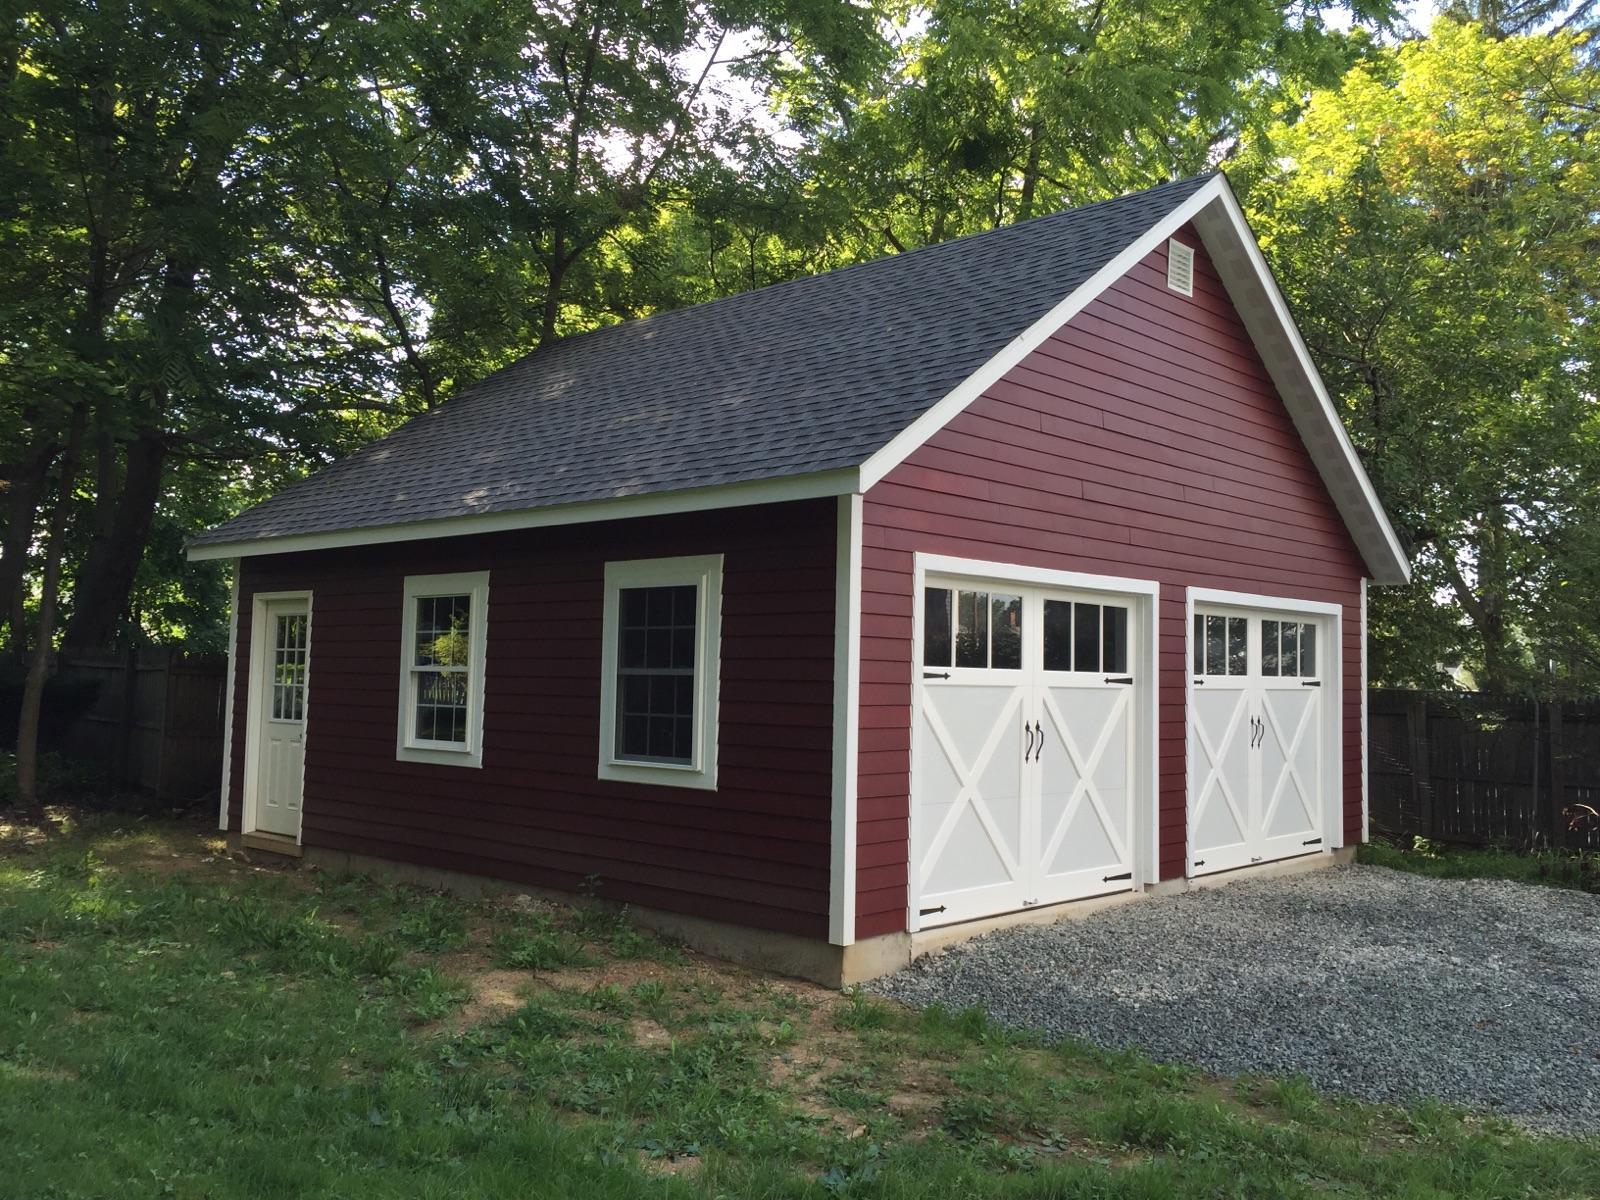 Garages Amish Garage 1 Car Garage 2 Car Garage 3 Car